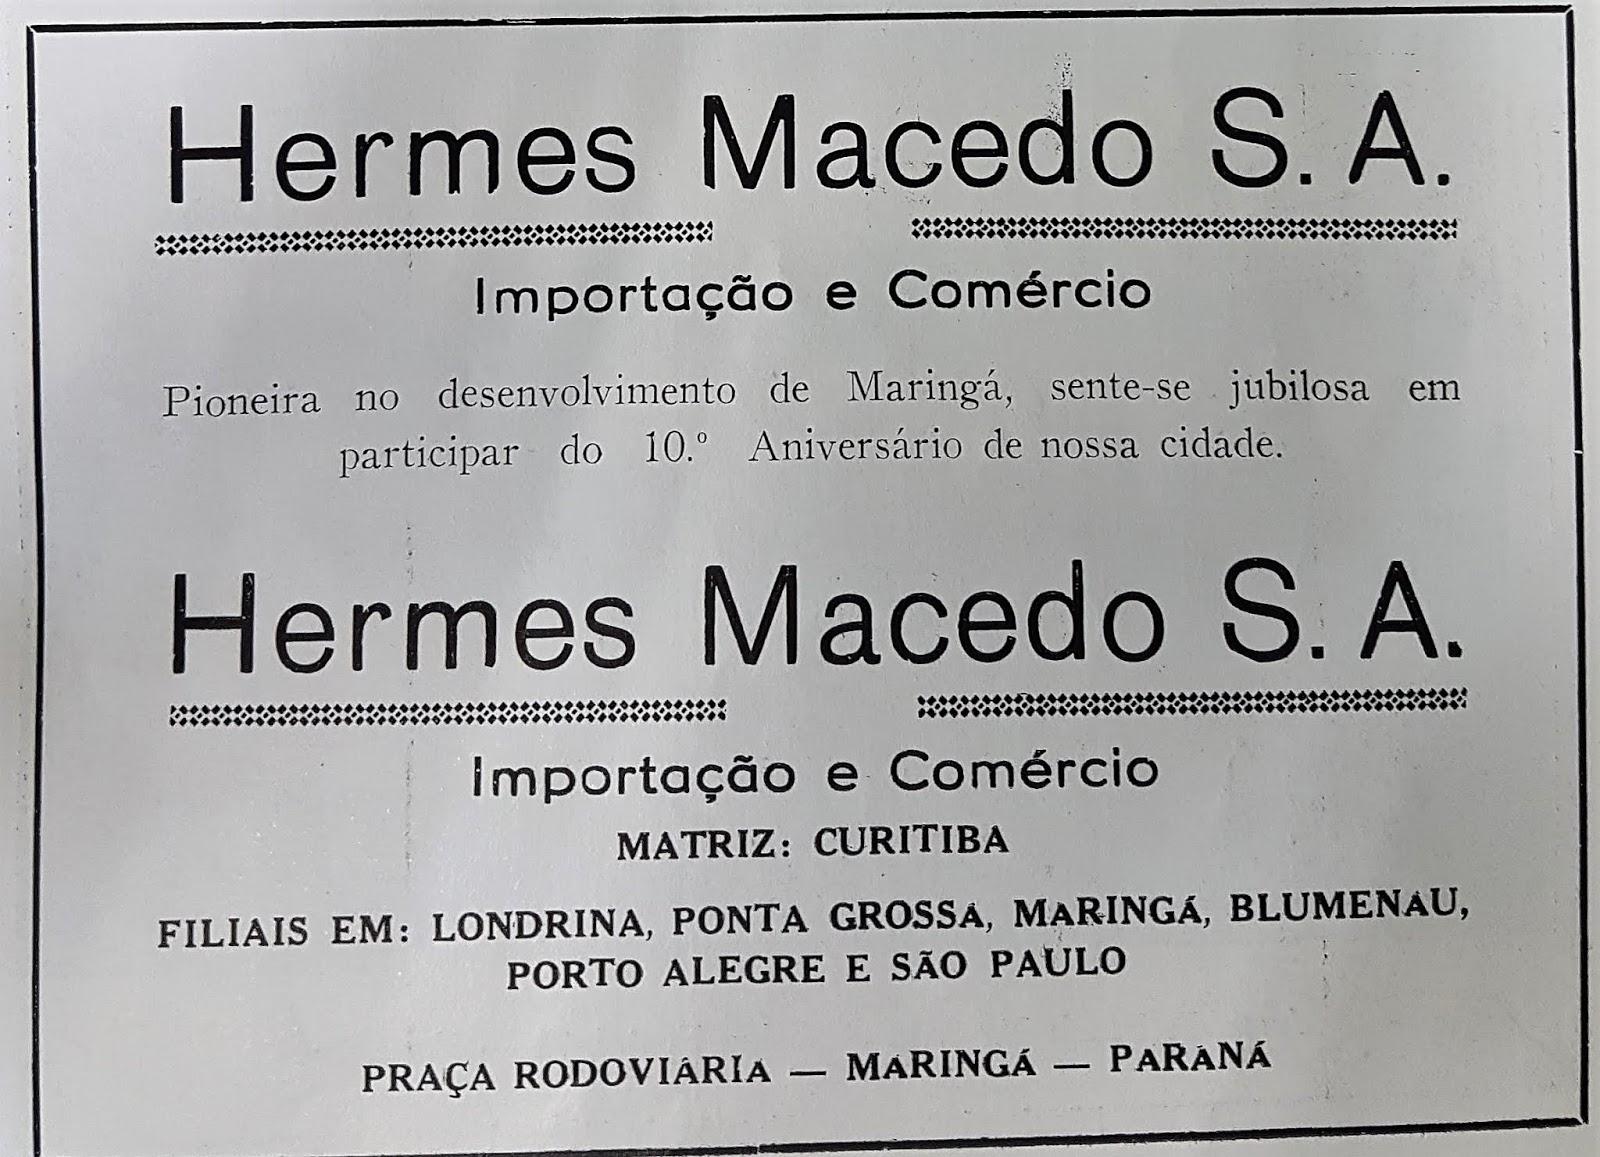 Anúncio da Hermes Macedo S.A. - 1957